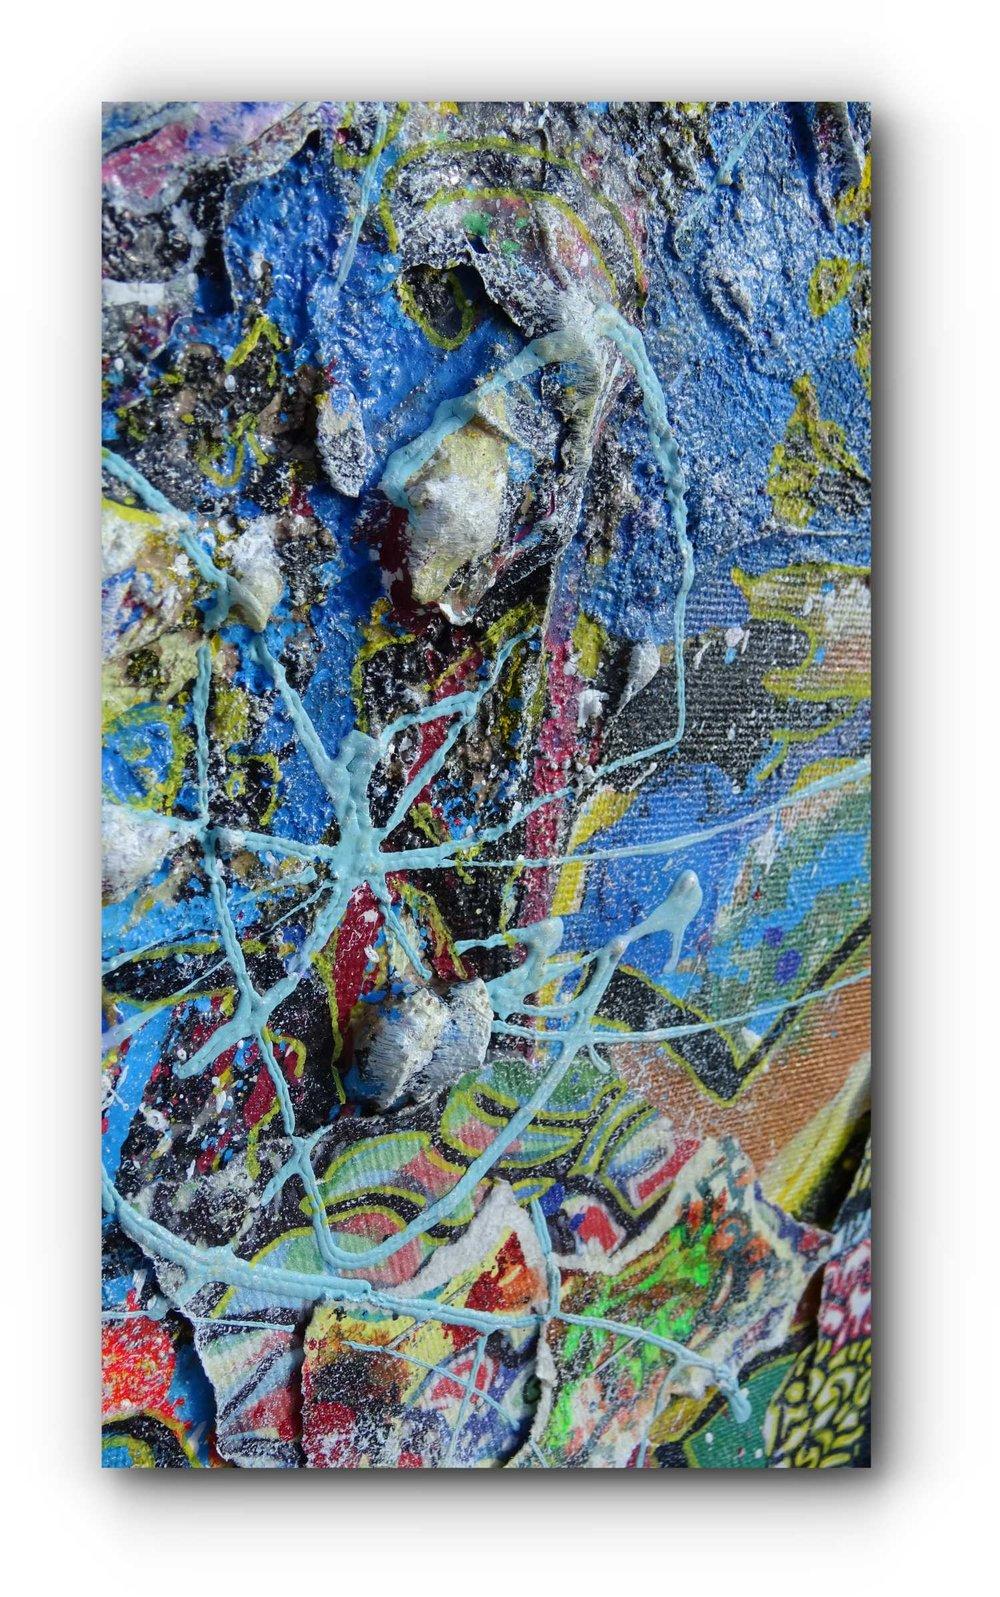 painting-detail-8-pillars-cosmos-artists-ingress-vortices.jpg